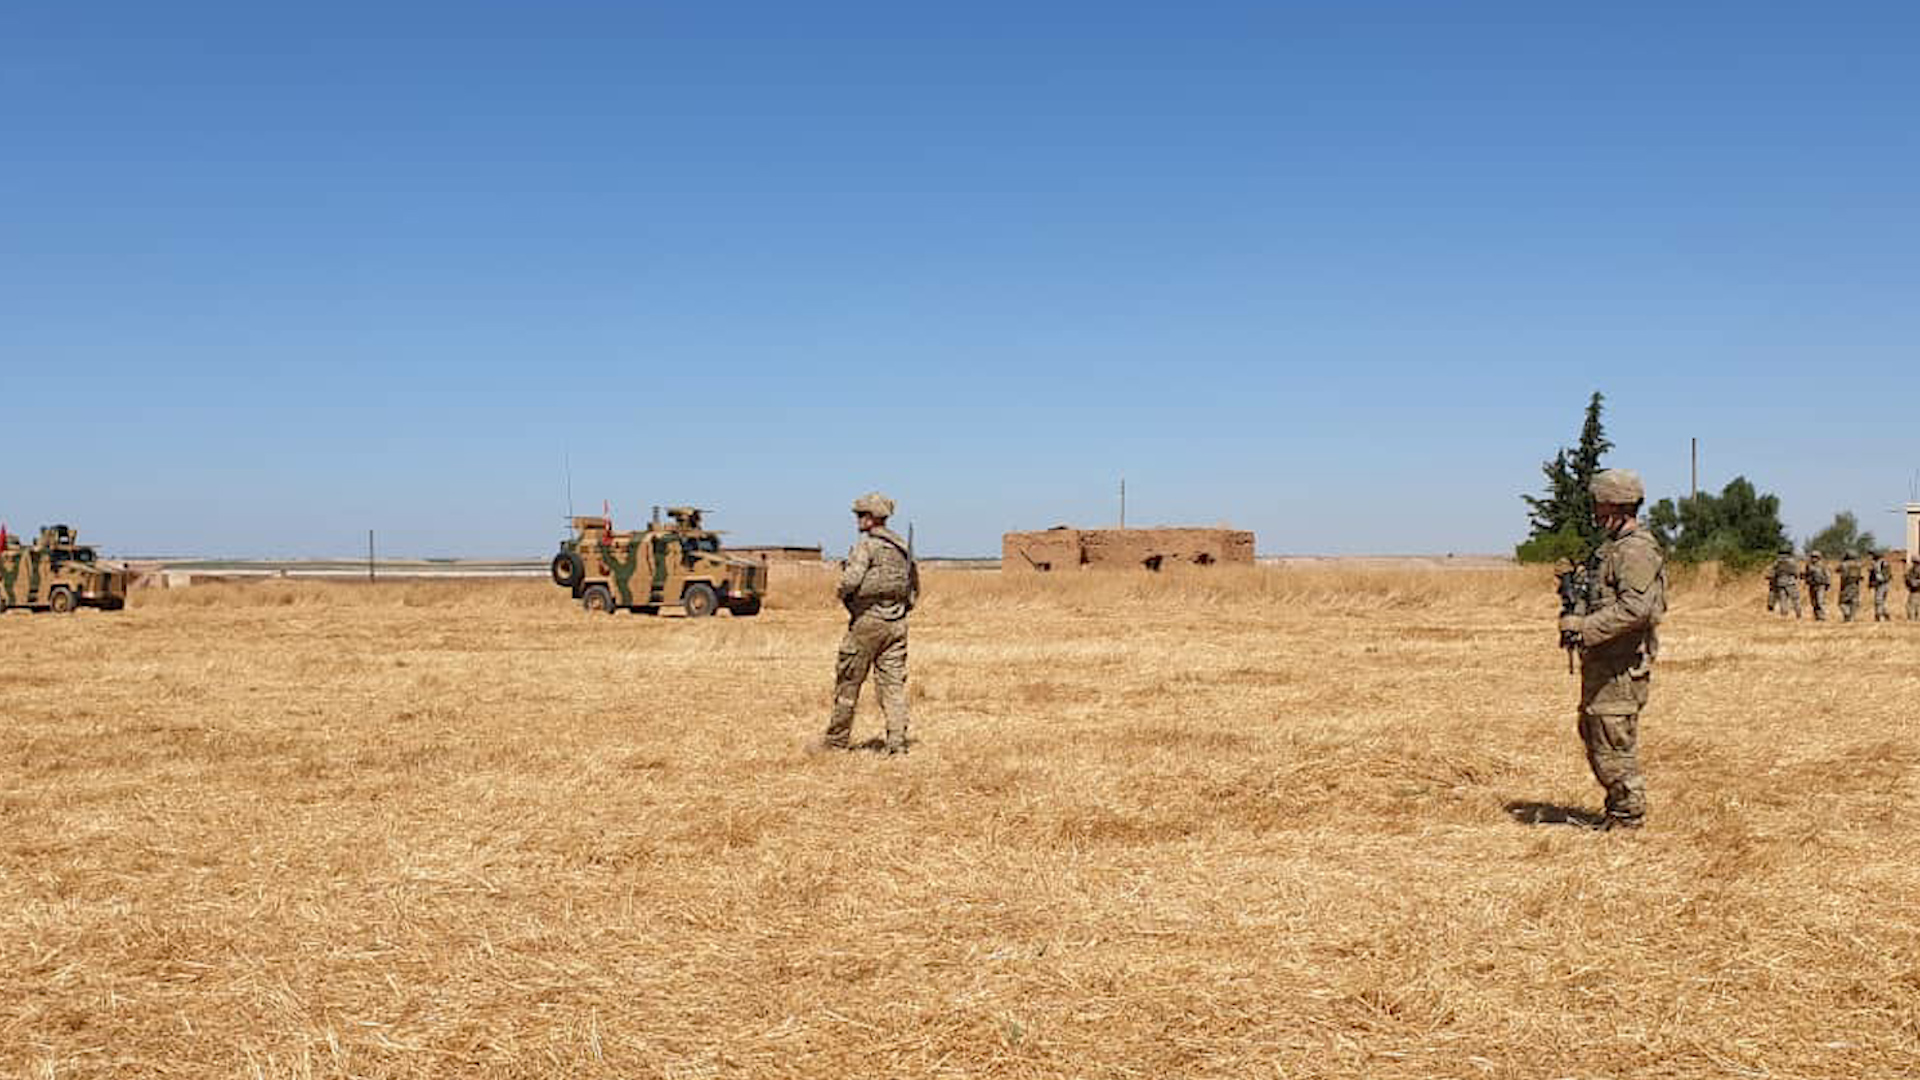 Photo of تسيير دوريات مراقبة أمريكية تركية على الحدود مع كري سبي / تل ابيض